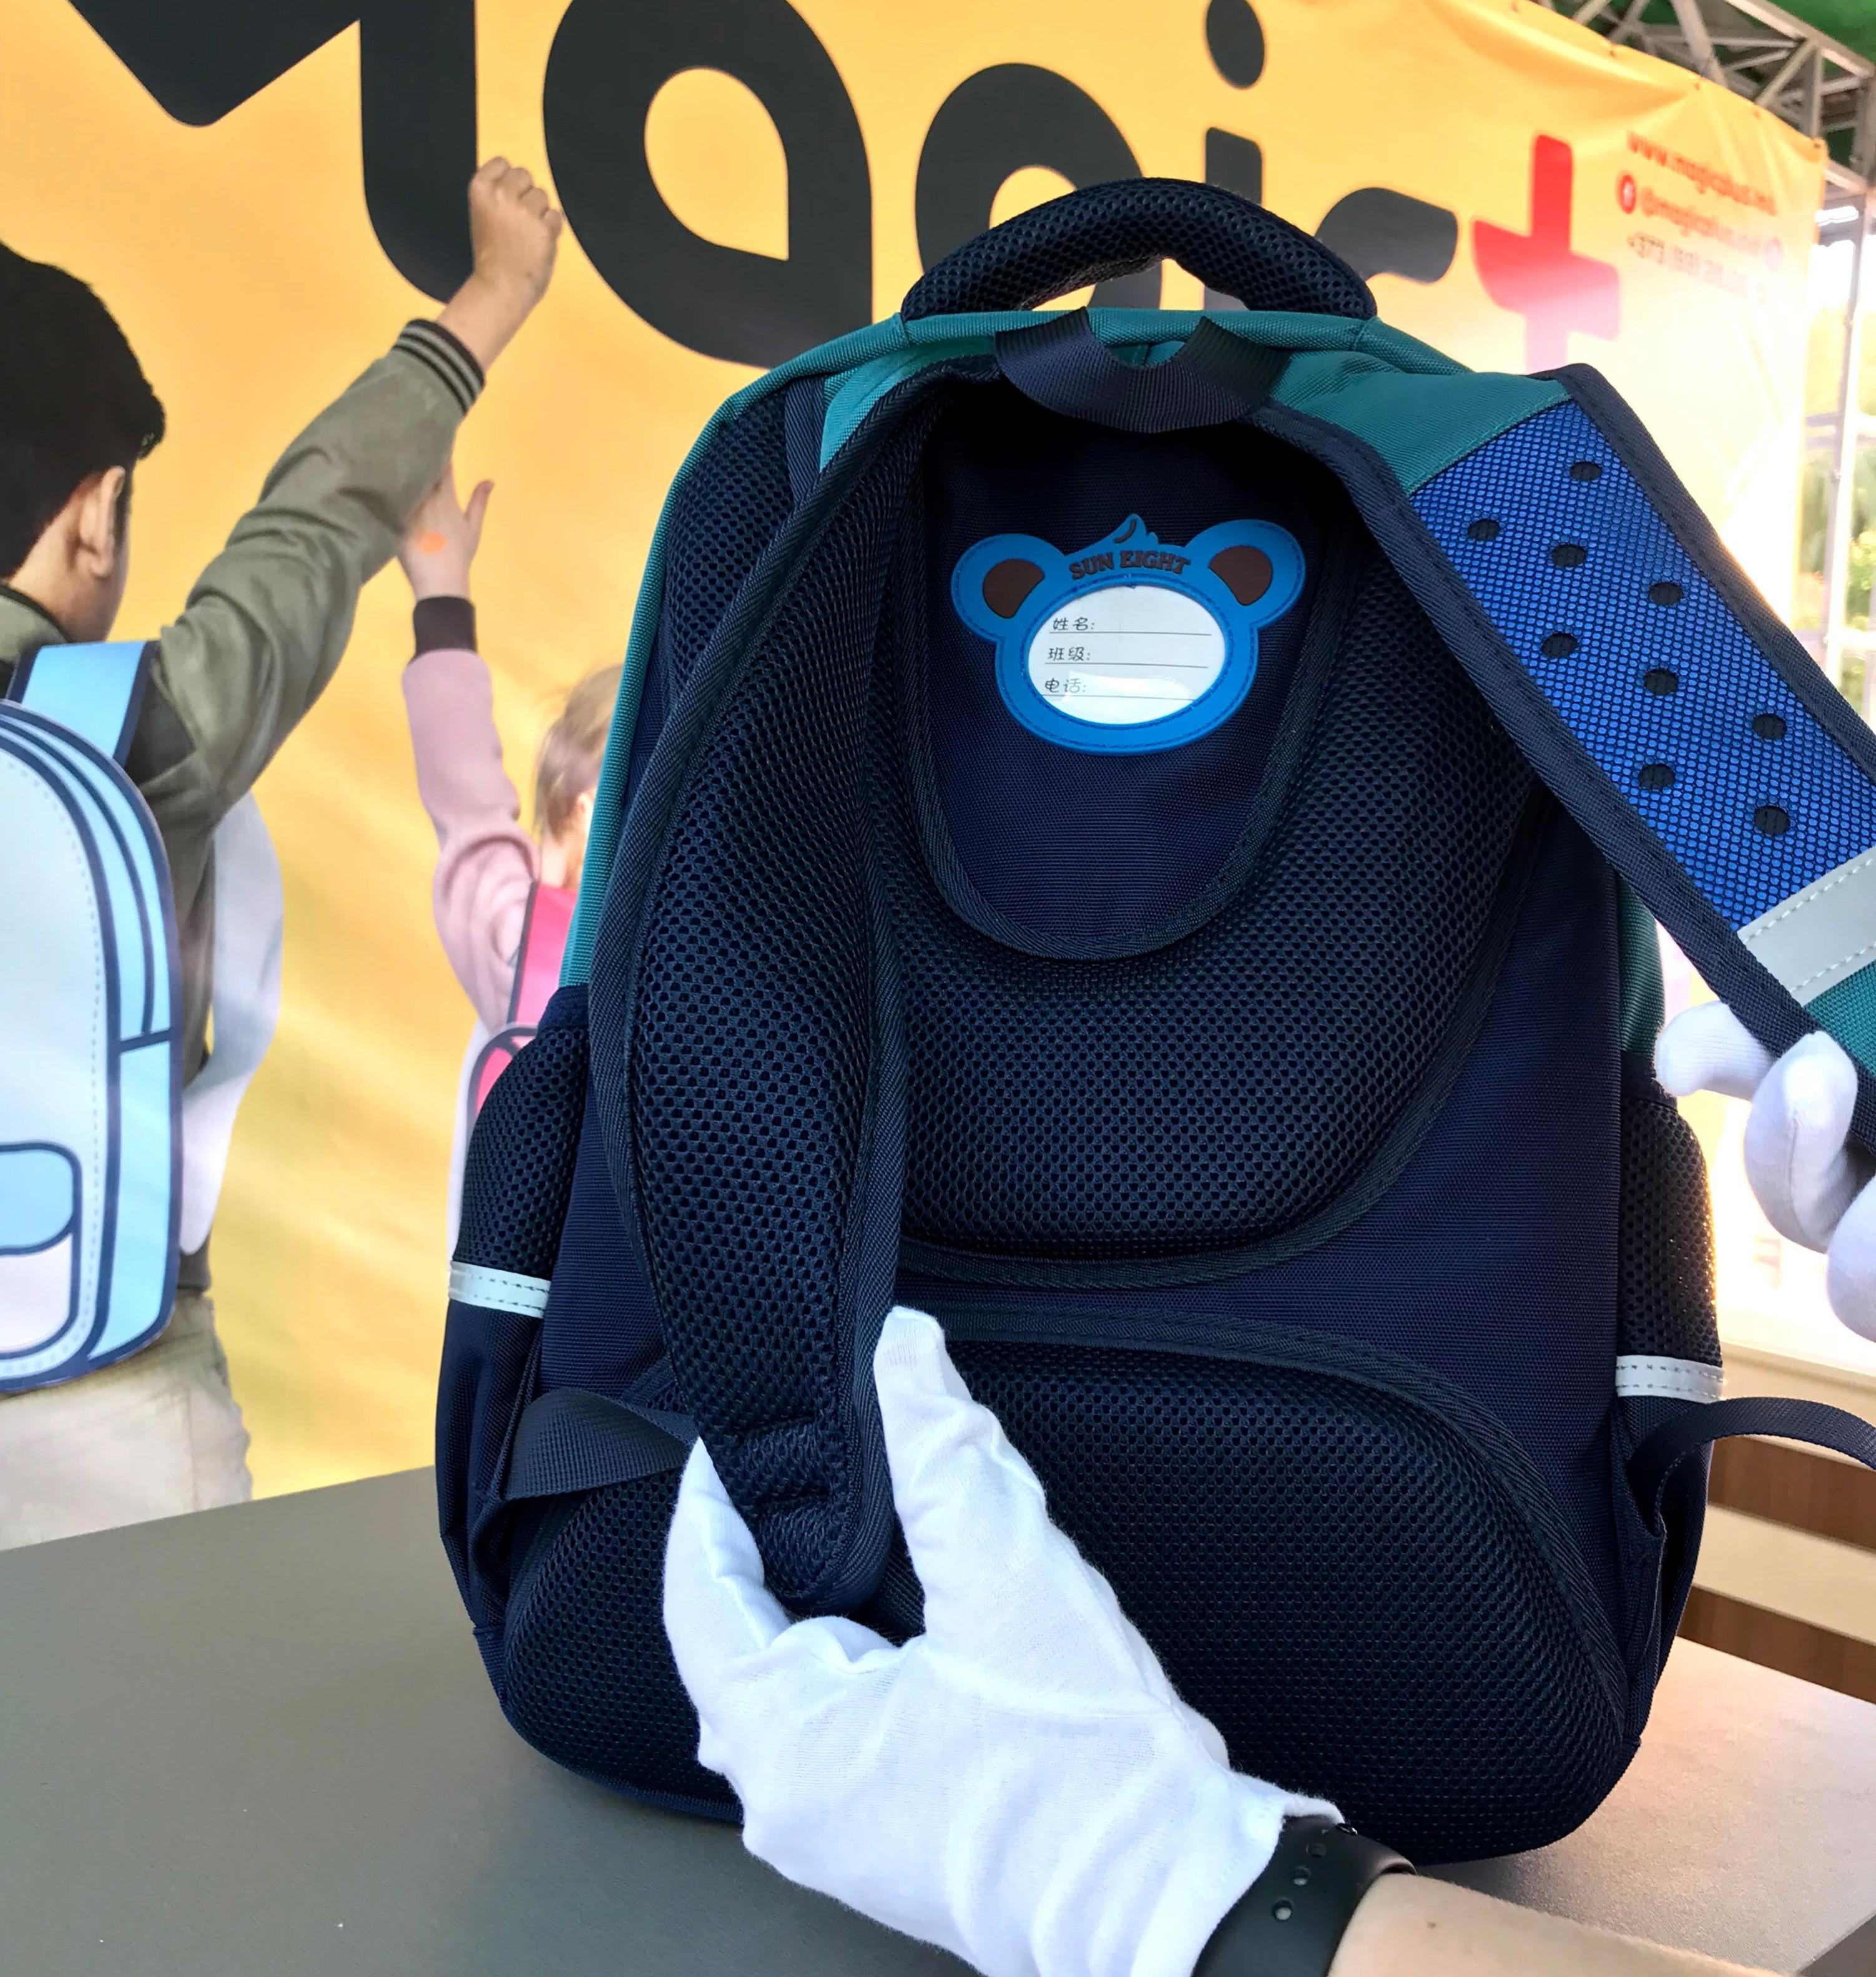 Thumbnail: Rucsac de Școală ULTRA-ORTOPEDIC - Băieței - Model 109BEARS